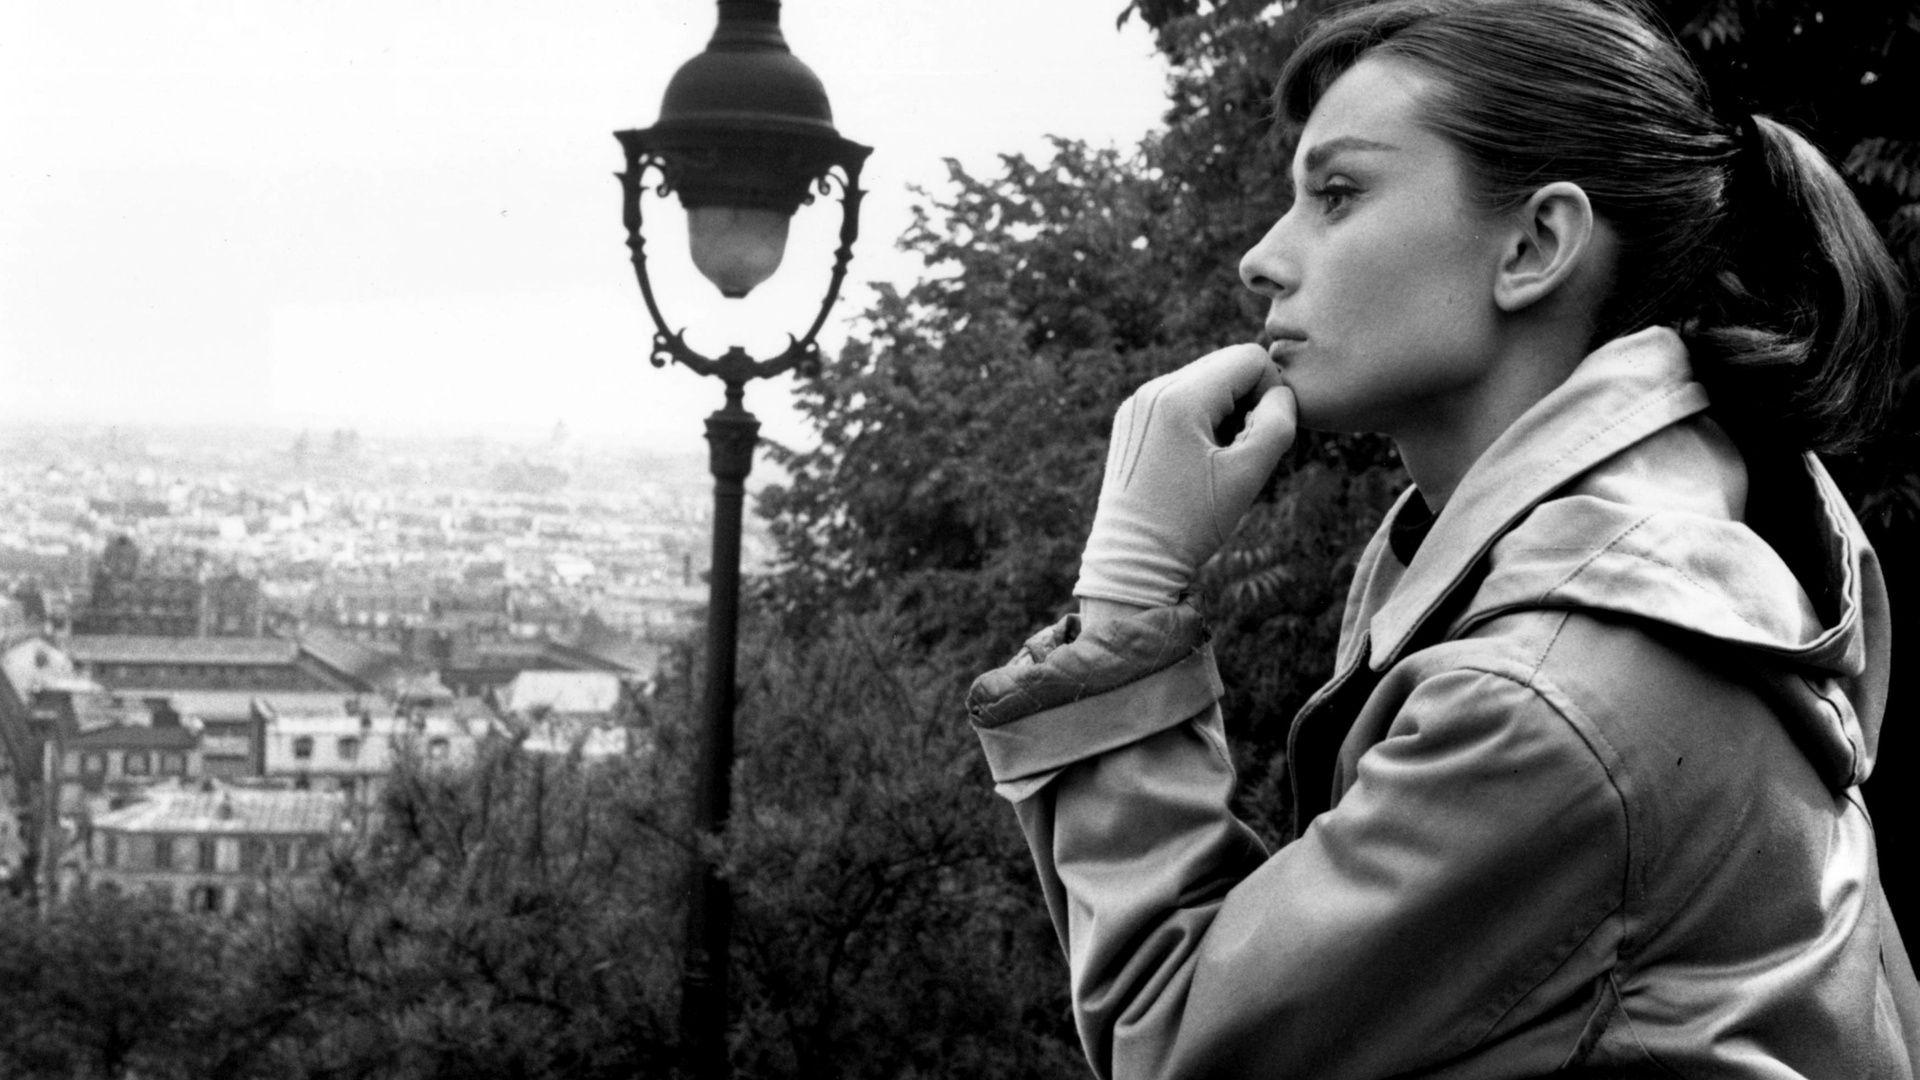 Audrey Hepburn full hd 1080p wallpaper